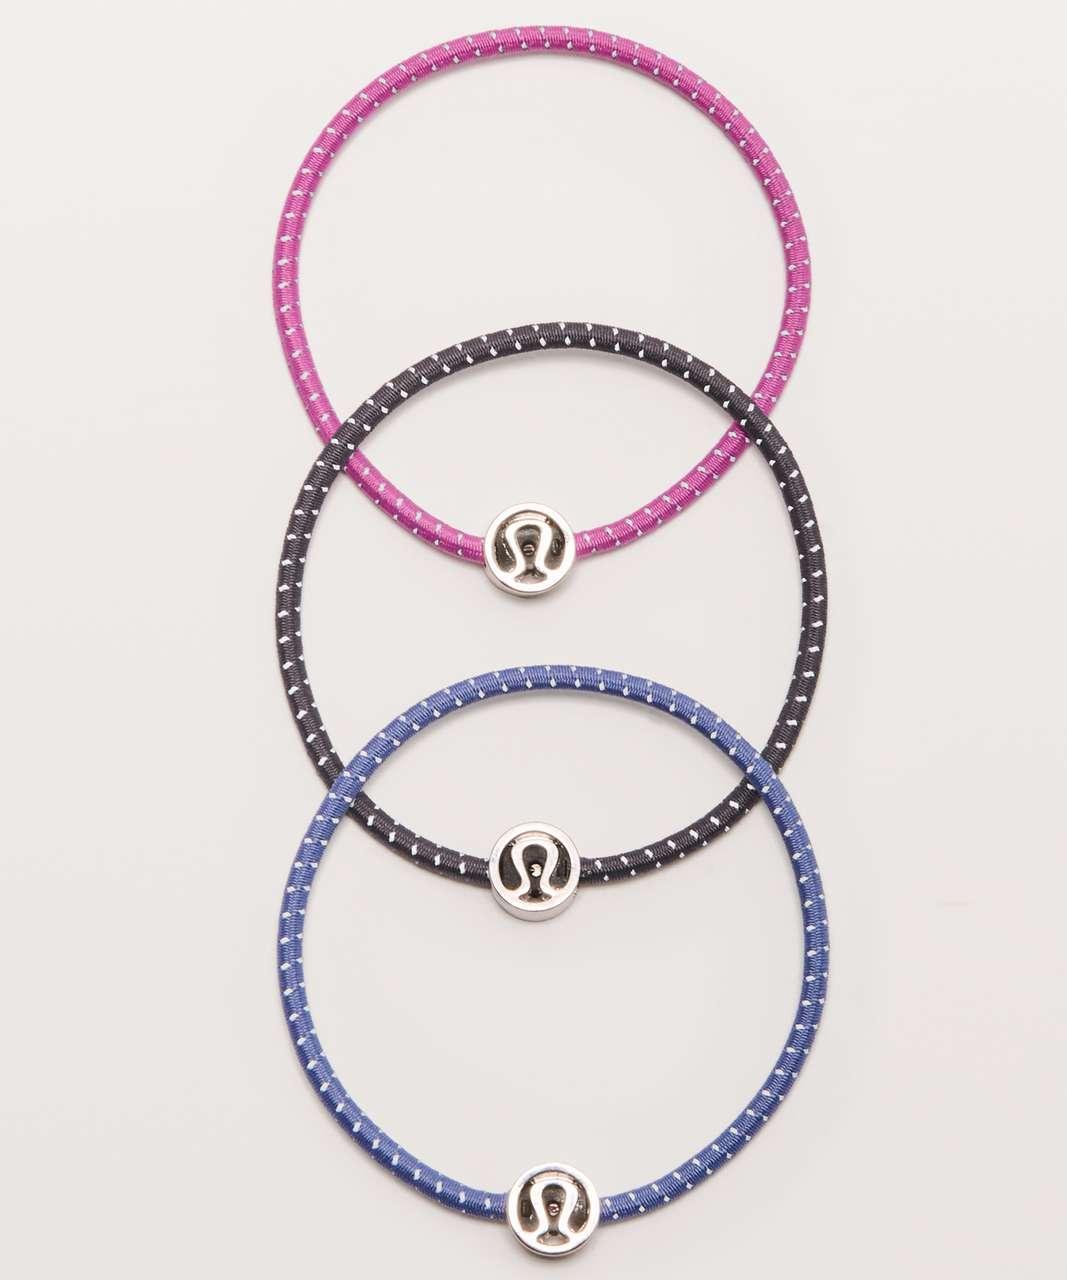 Lululemon Glow On Hair Ties - Iron Purple / Hyacinth / Graphite Purple